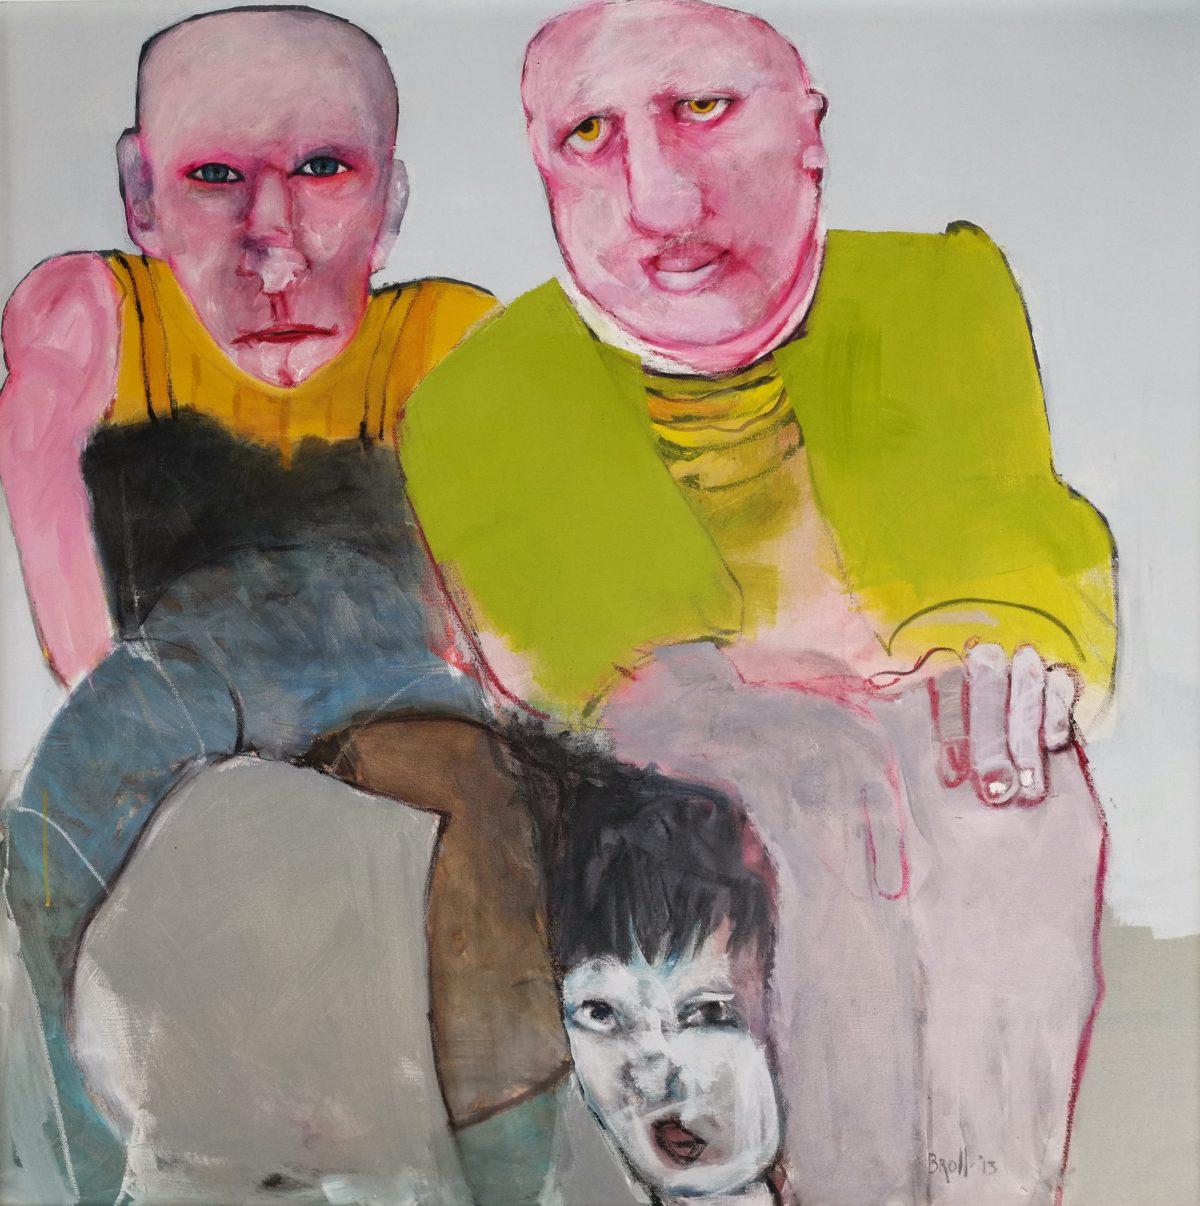 Terri Broll - Complex People - 2013